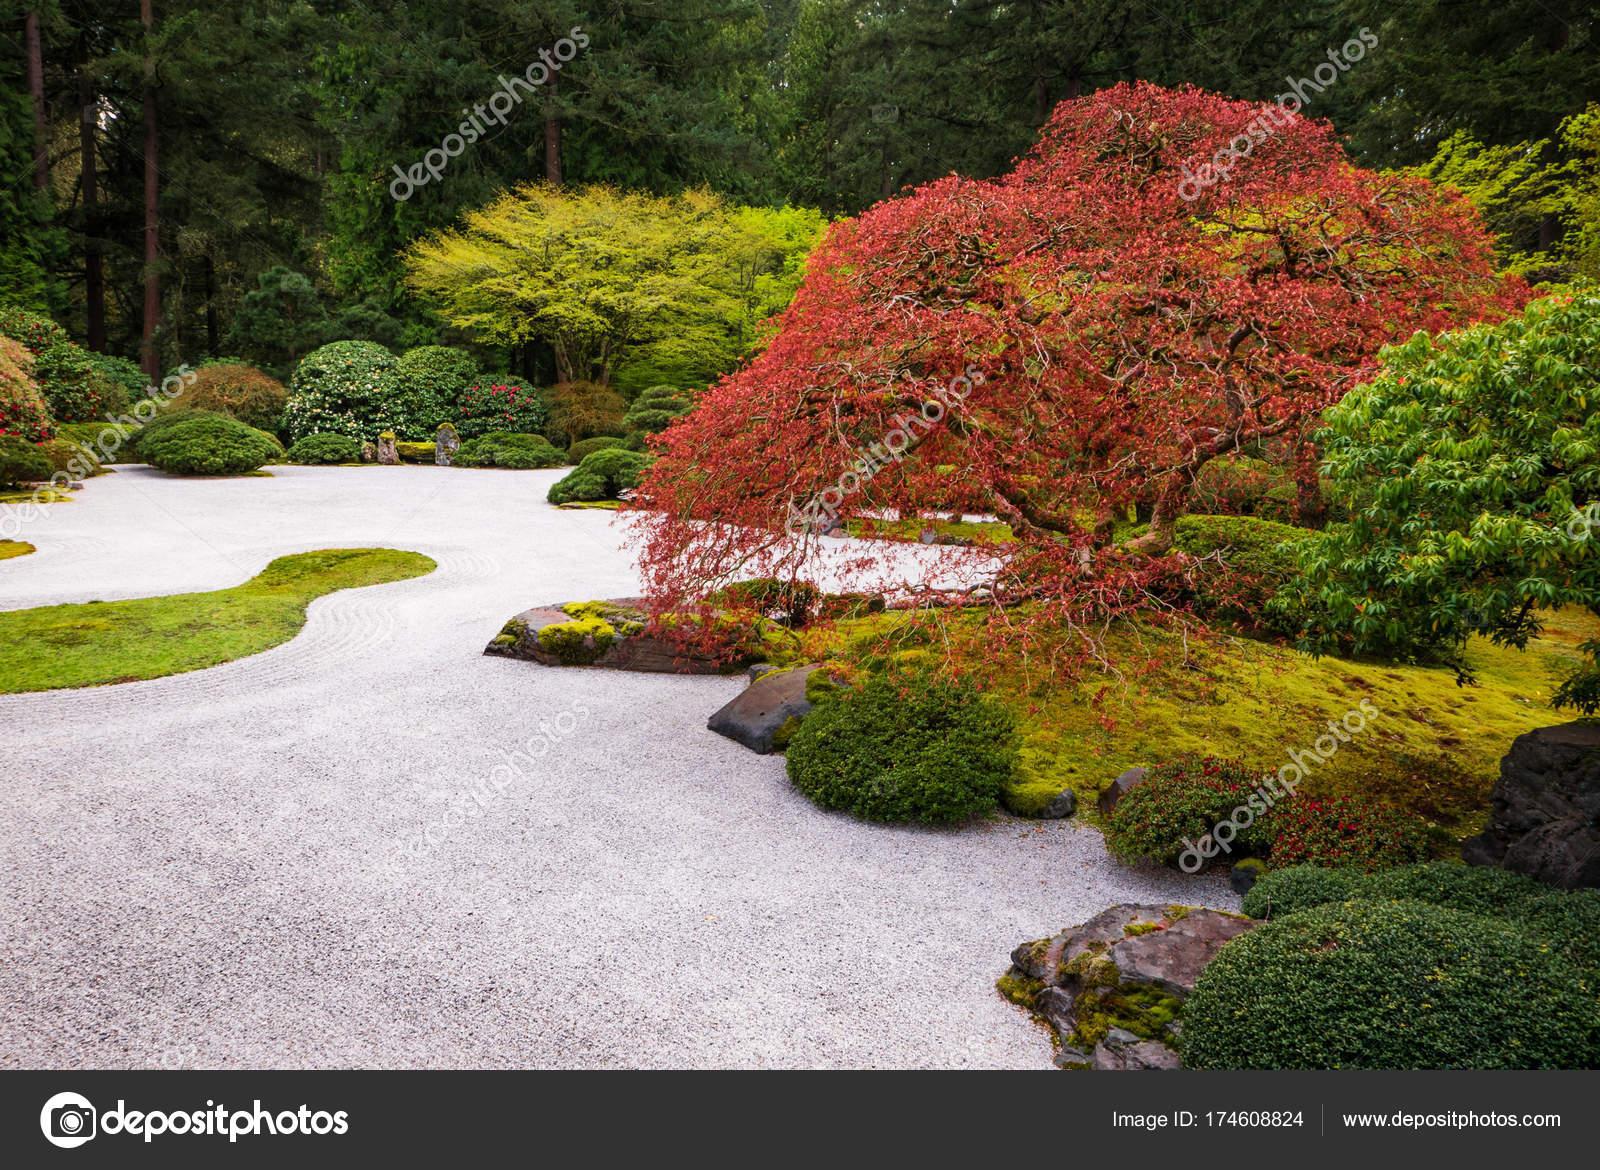 japanischer steingarten stockfoto tom 174608824. Black Bedroom Furniture Sets. Home Design Ideas